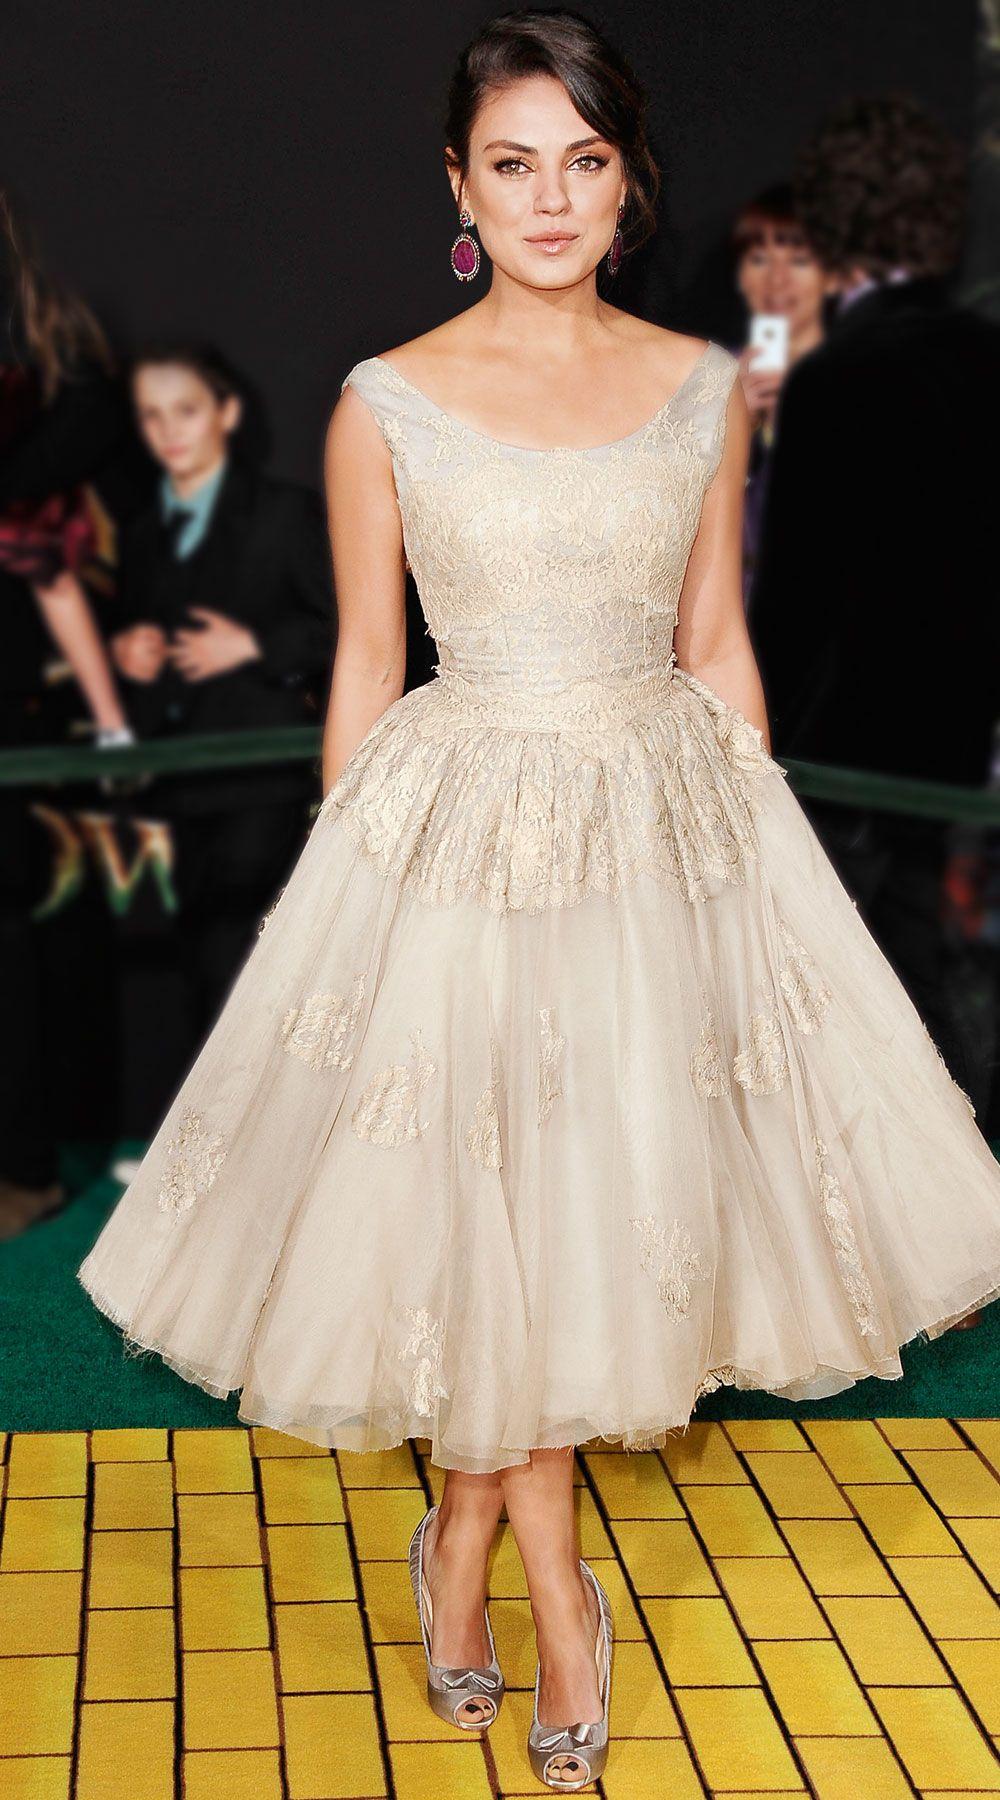 Gorgeous dress champagne sparkles full swirly skirt my summer